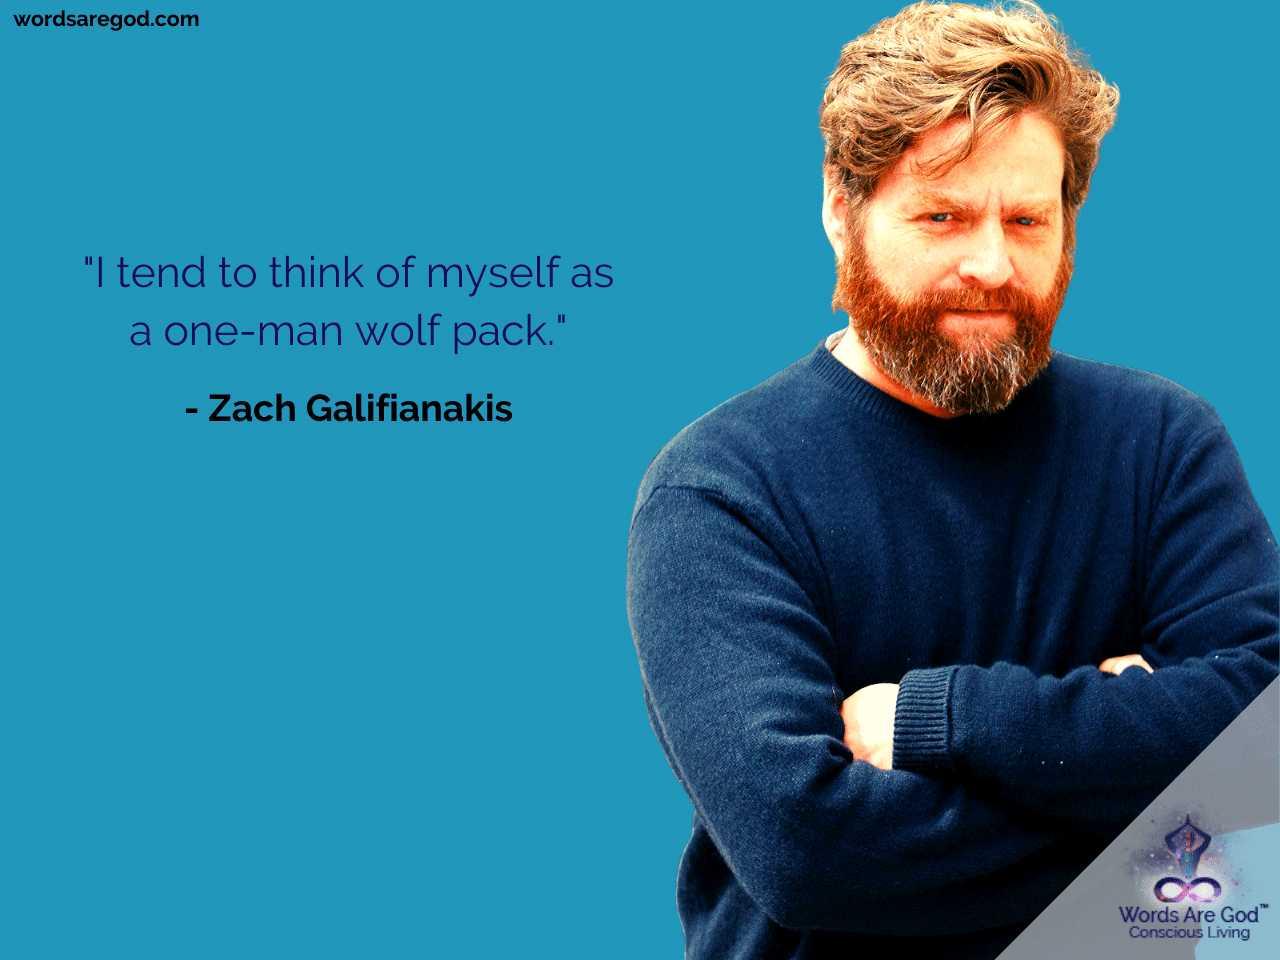 Zach Galifianakis Love Quote